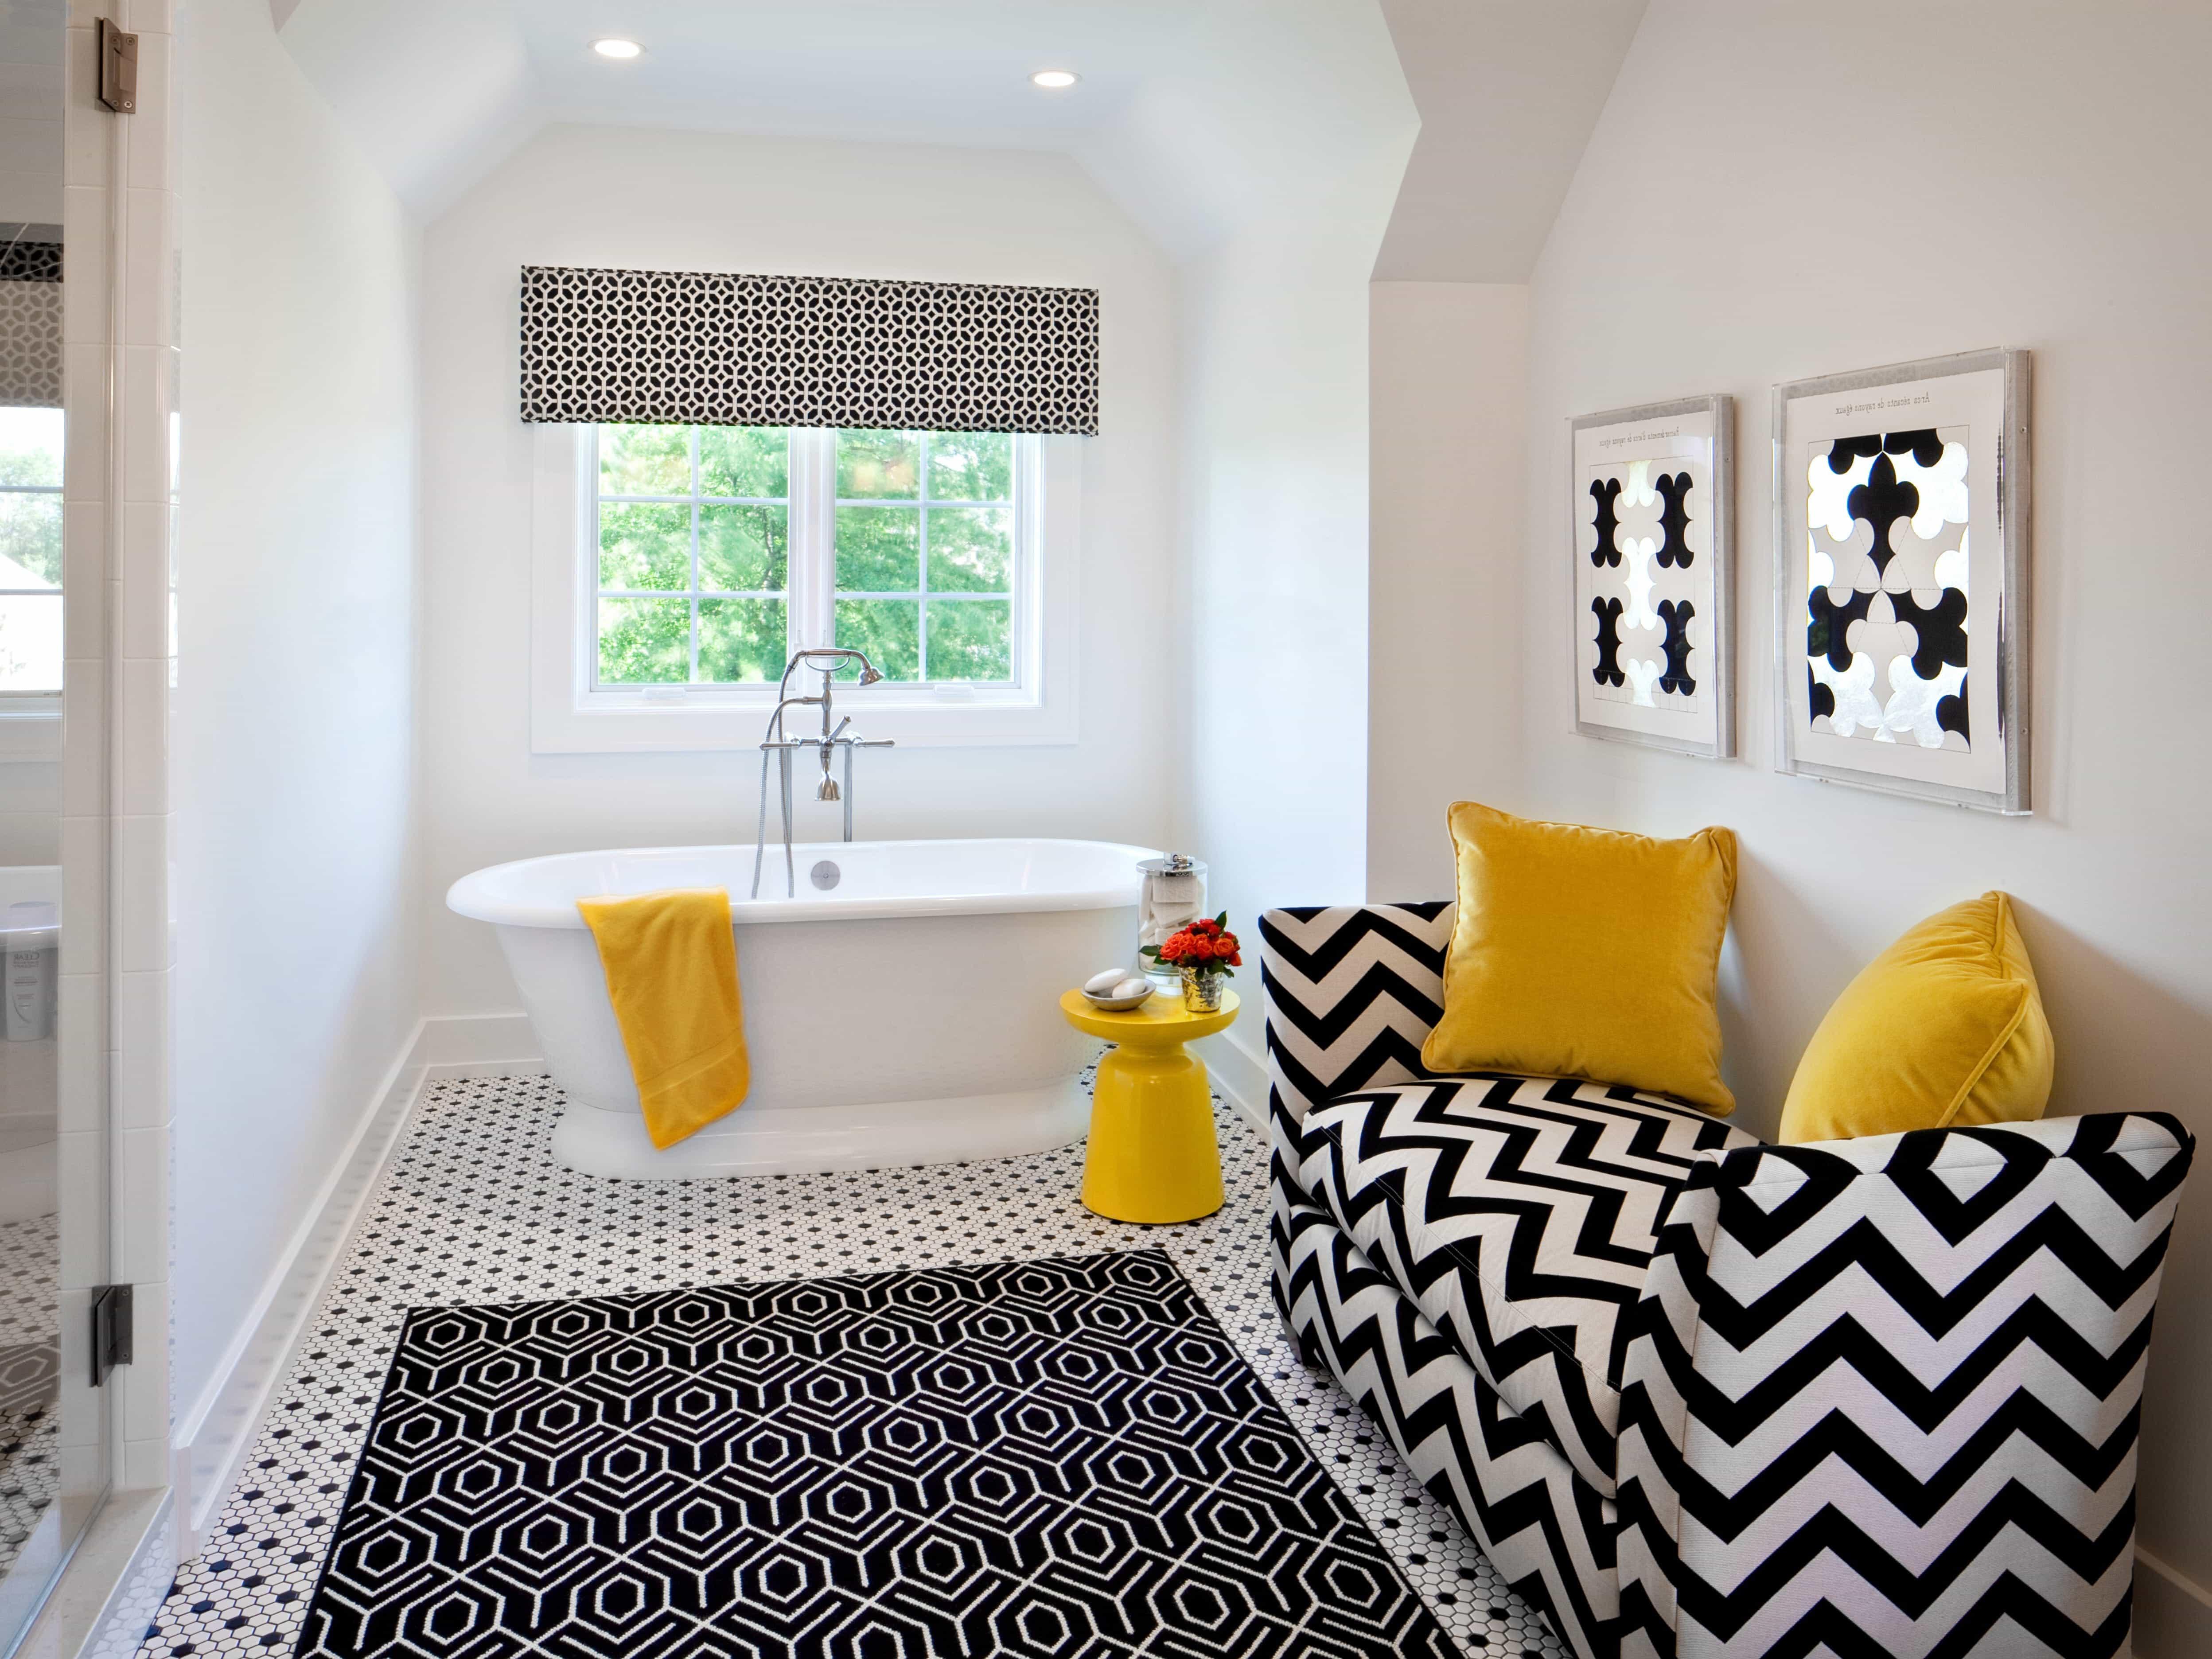 Monochromatic Rug Design For Pop Bathroom Interior Theme (View 1 of 11)